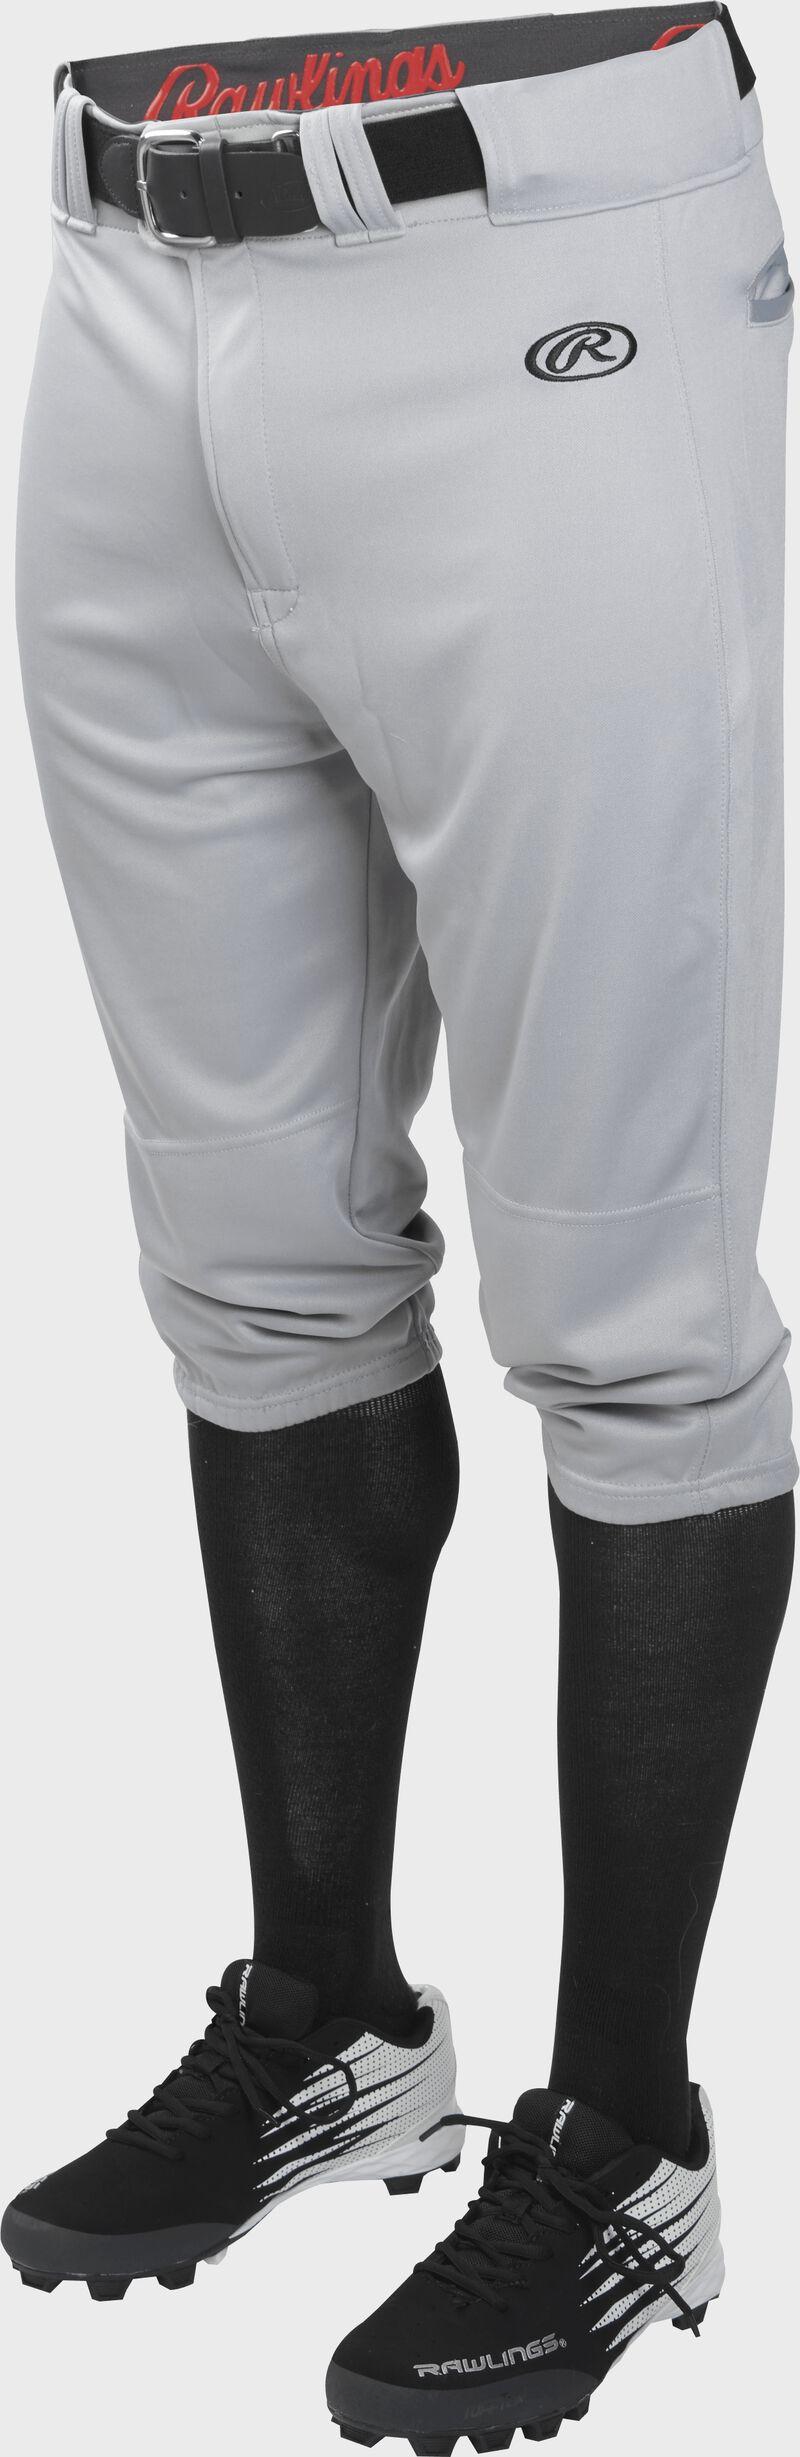 Front of Rawlings Blue Gray Adult Launch Knicker Baseball Pant - SKU #LNCHKP